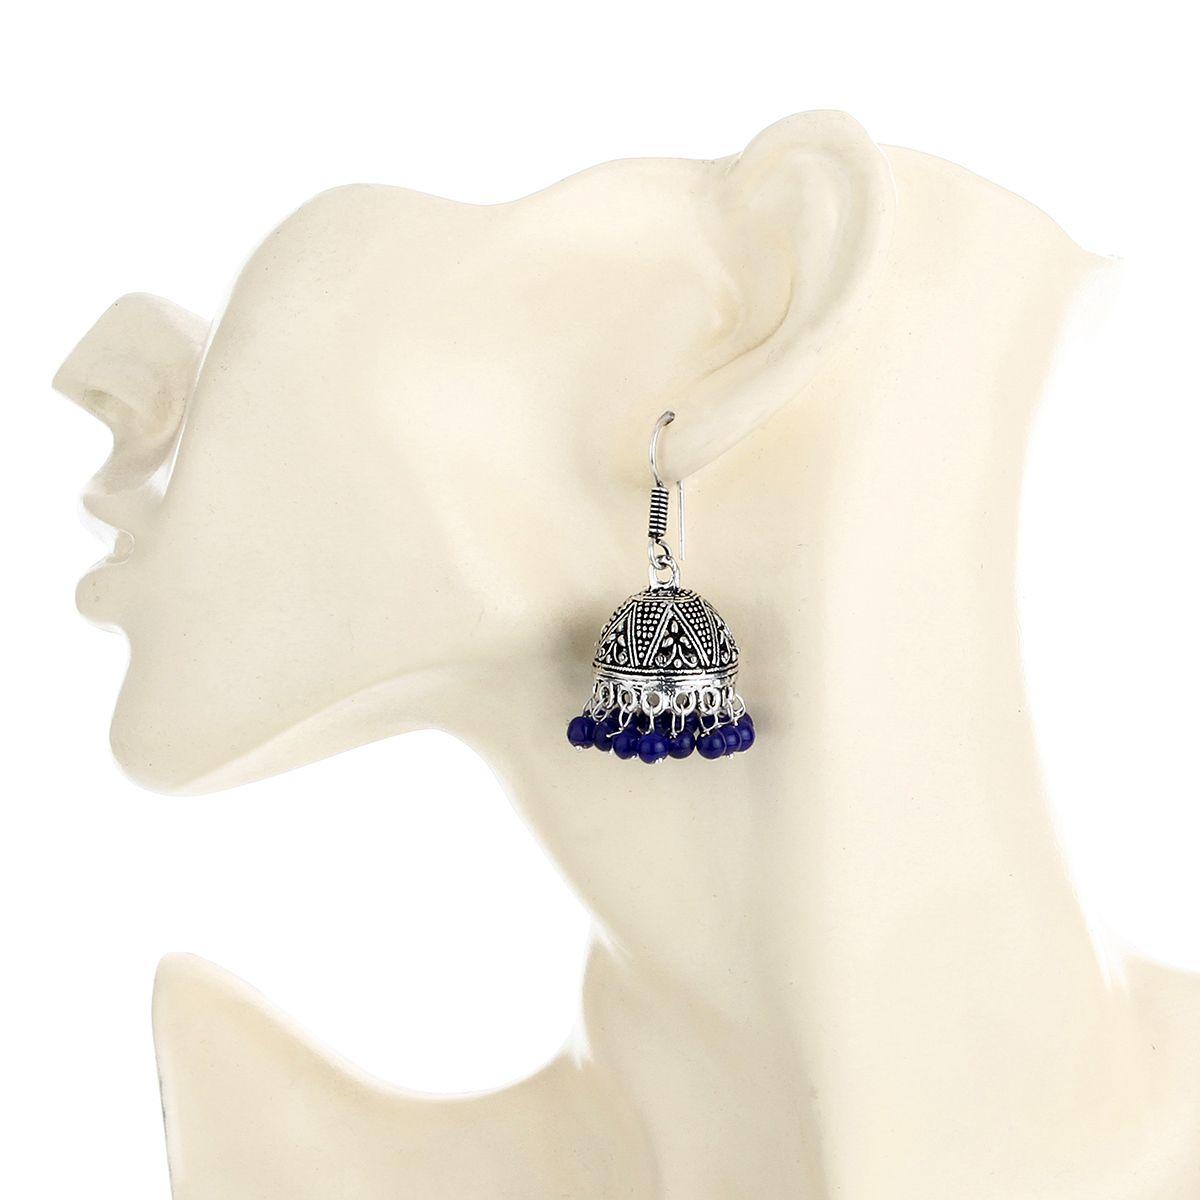 WATCH ME Banjara Boho pom Pom Trendy Fashionable Partywear Earrings Jhumki for Women Girls WMRPG-049